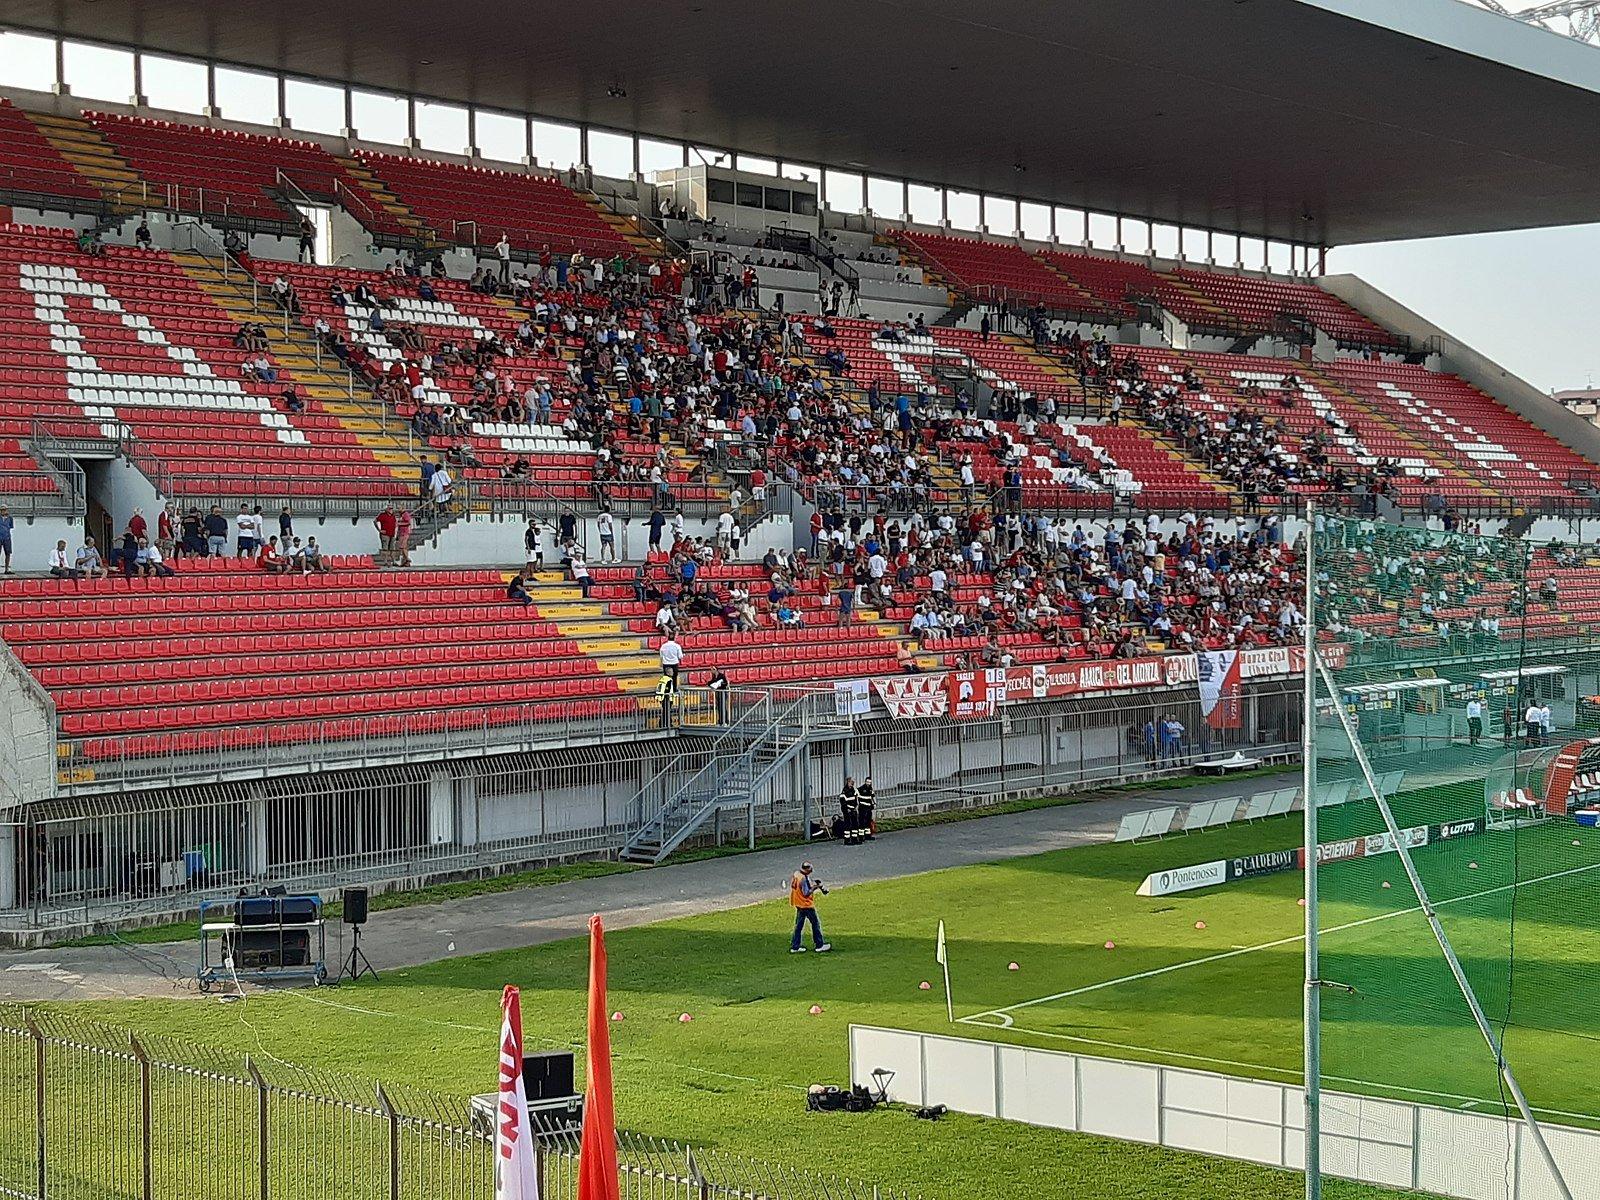 Monza Stadio Brianteo